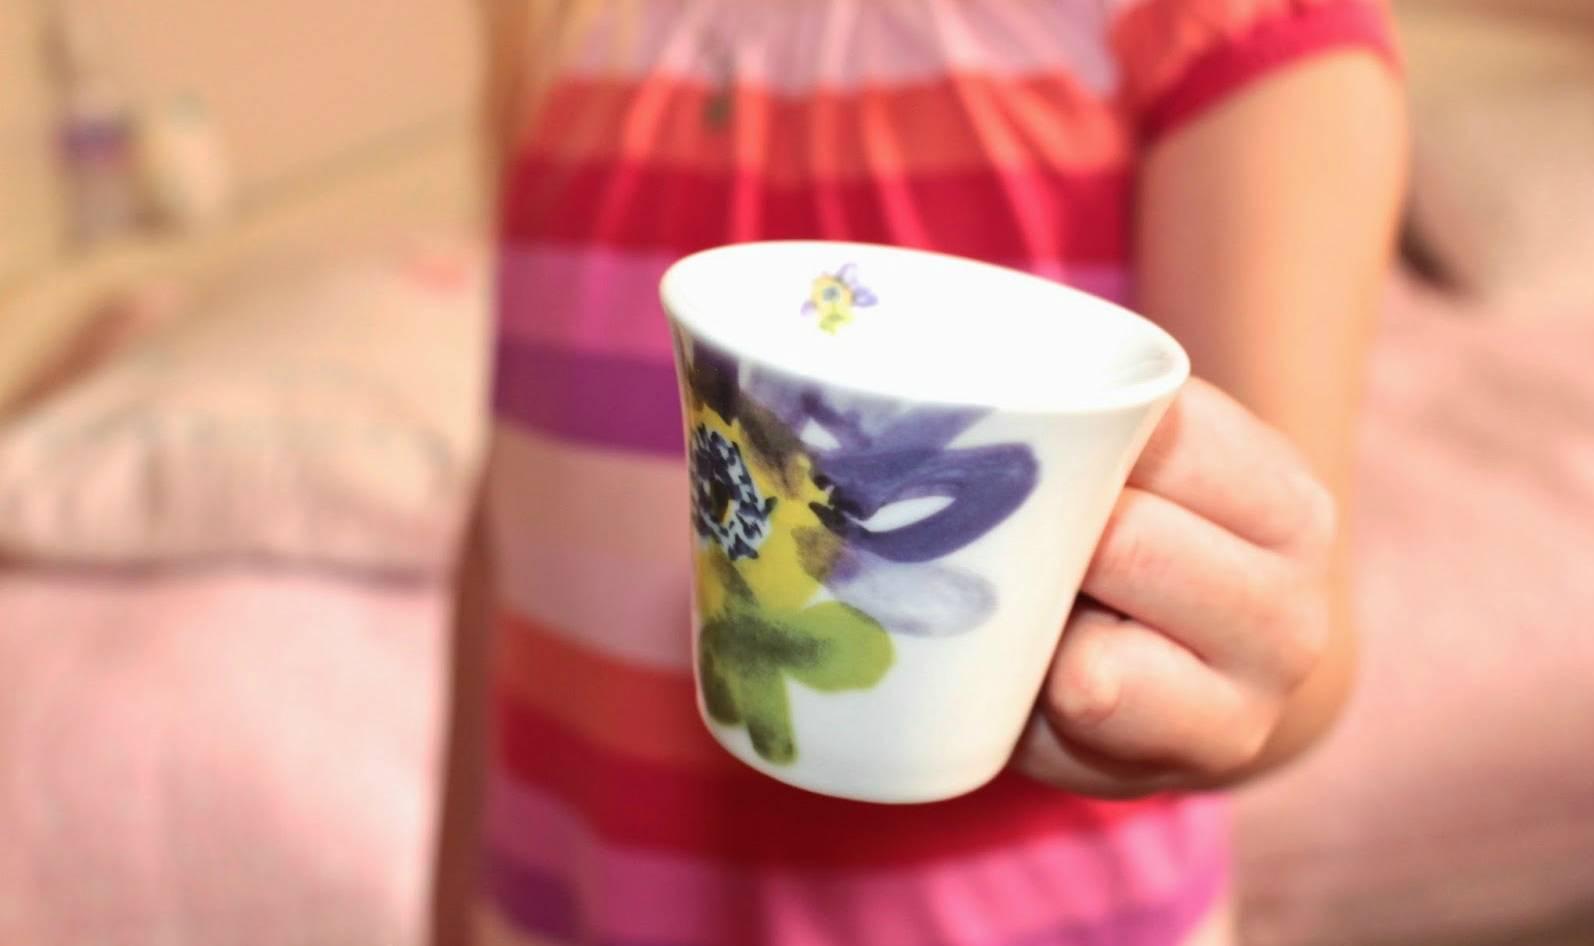 Девочка разбила чашку, и мать подняла на нее руку. Но тут вмешалась старушка...